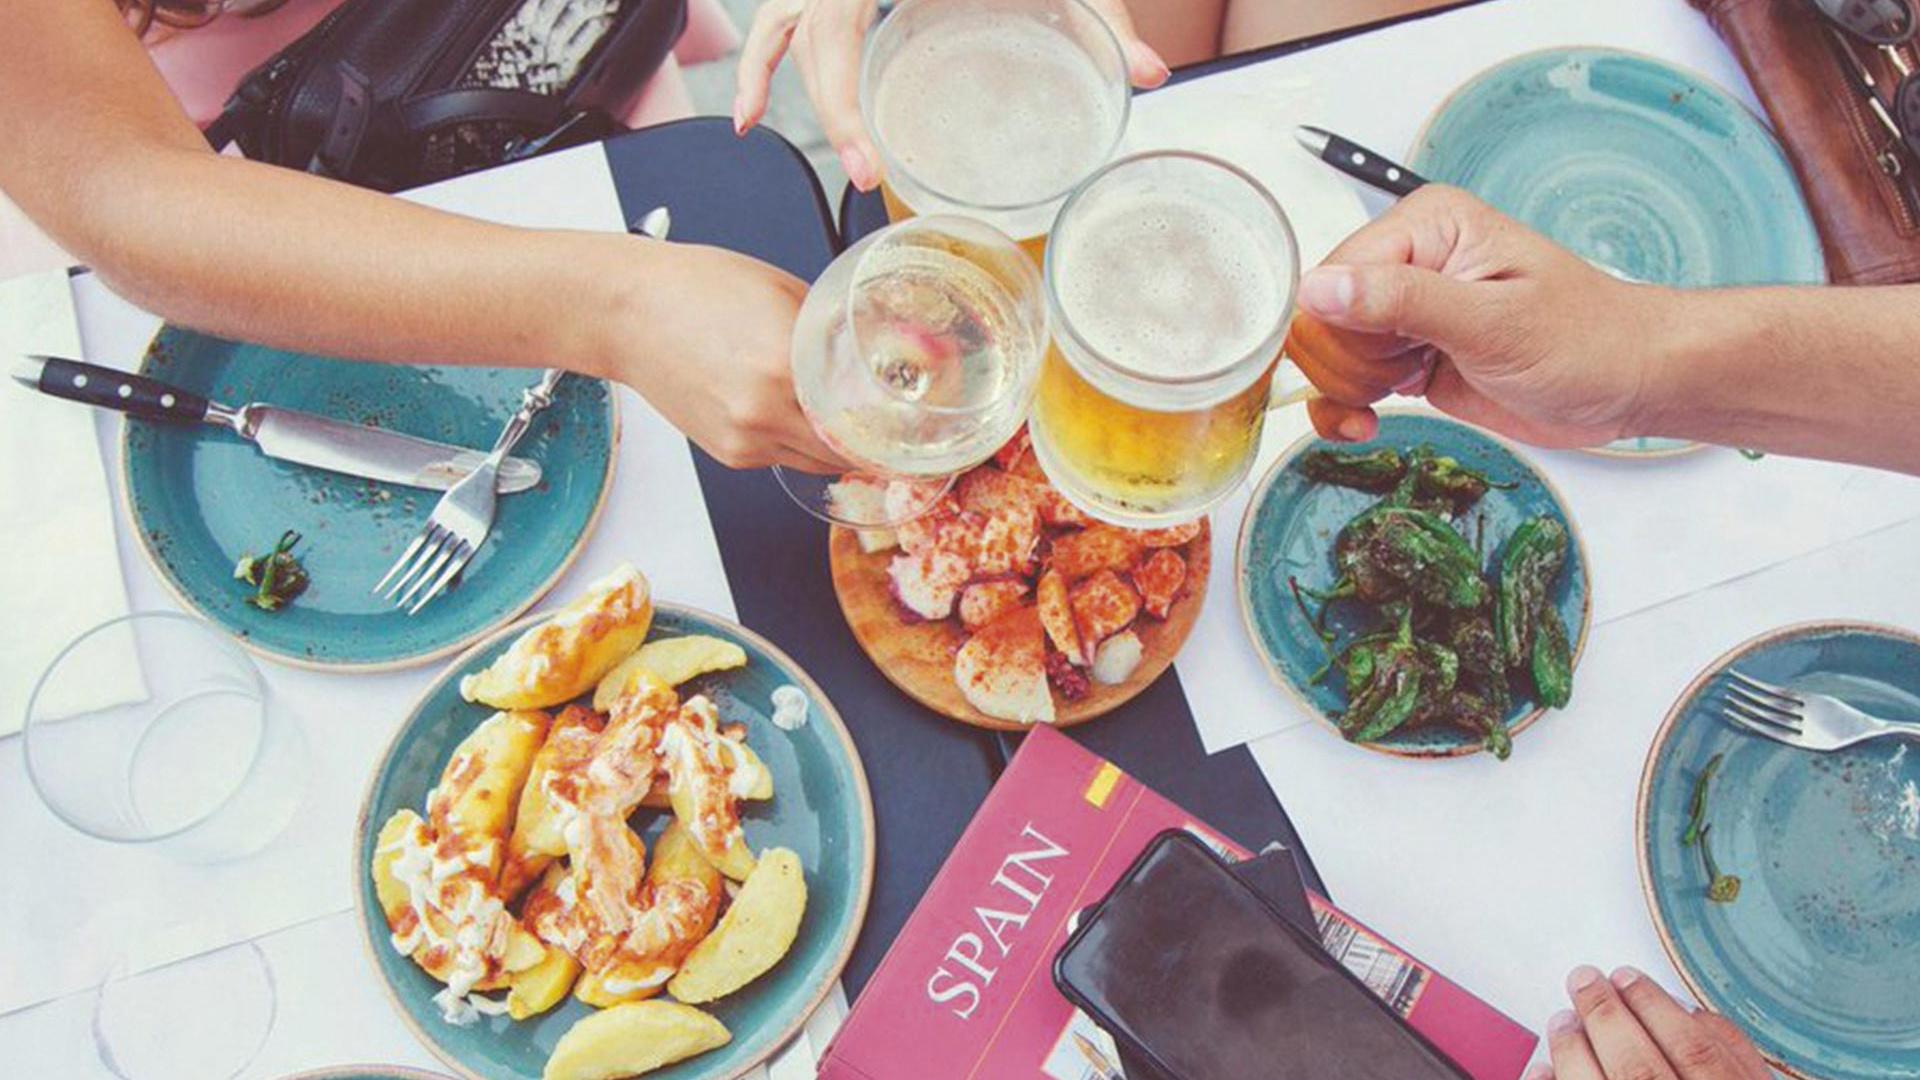 Sharing tapas at world tapas day in Spain